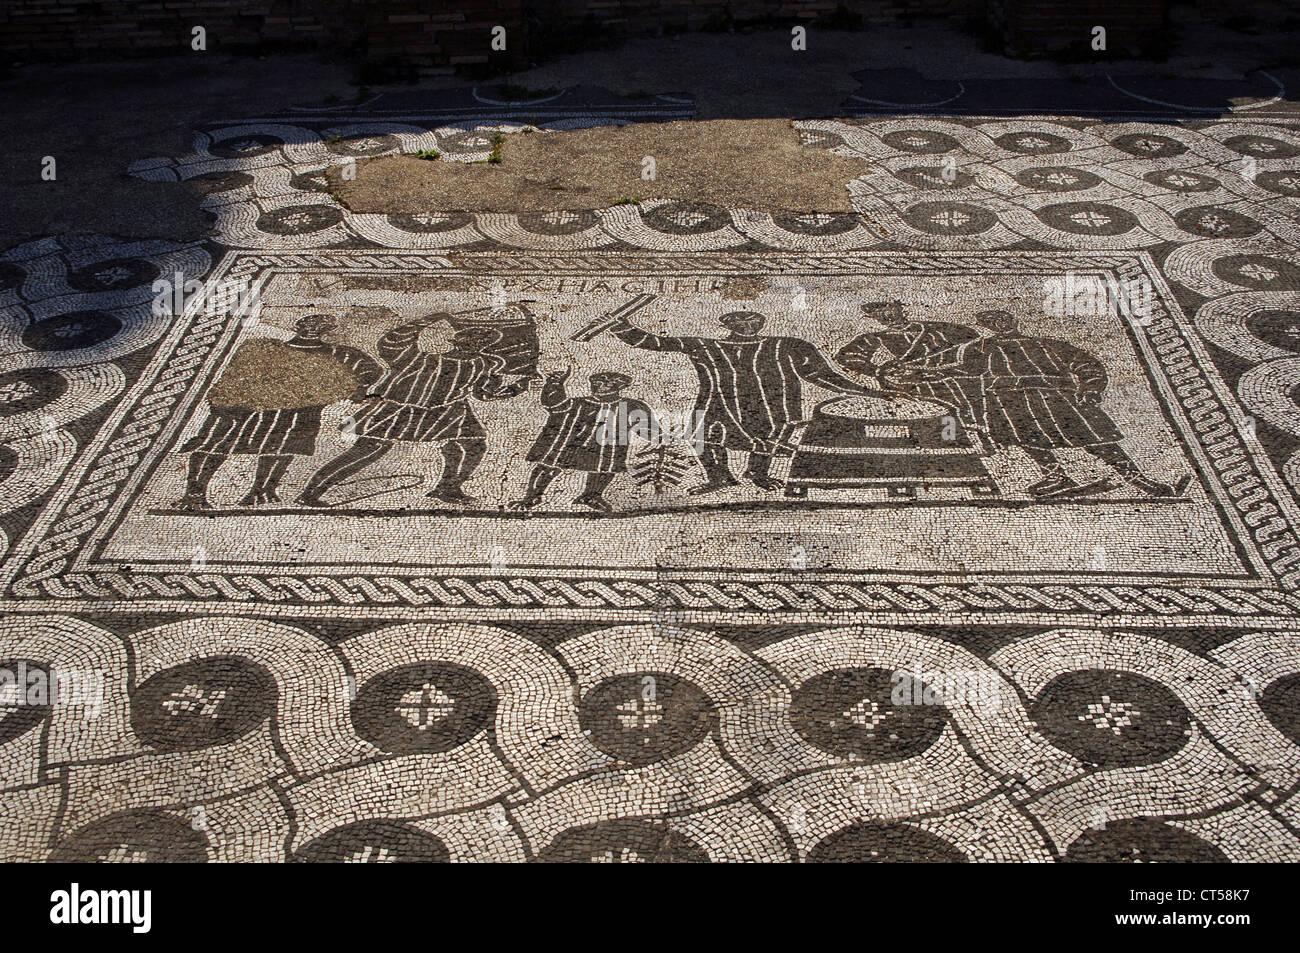 Ostia Antica. The Hall of the Grain Measurers. Mosaic depicting grain measurers at work. Stock Photo